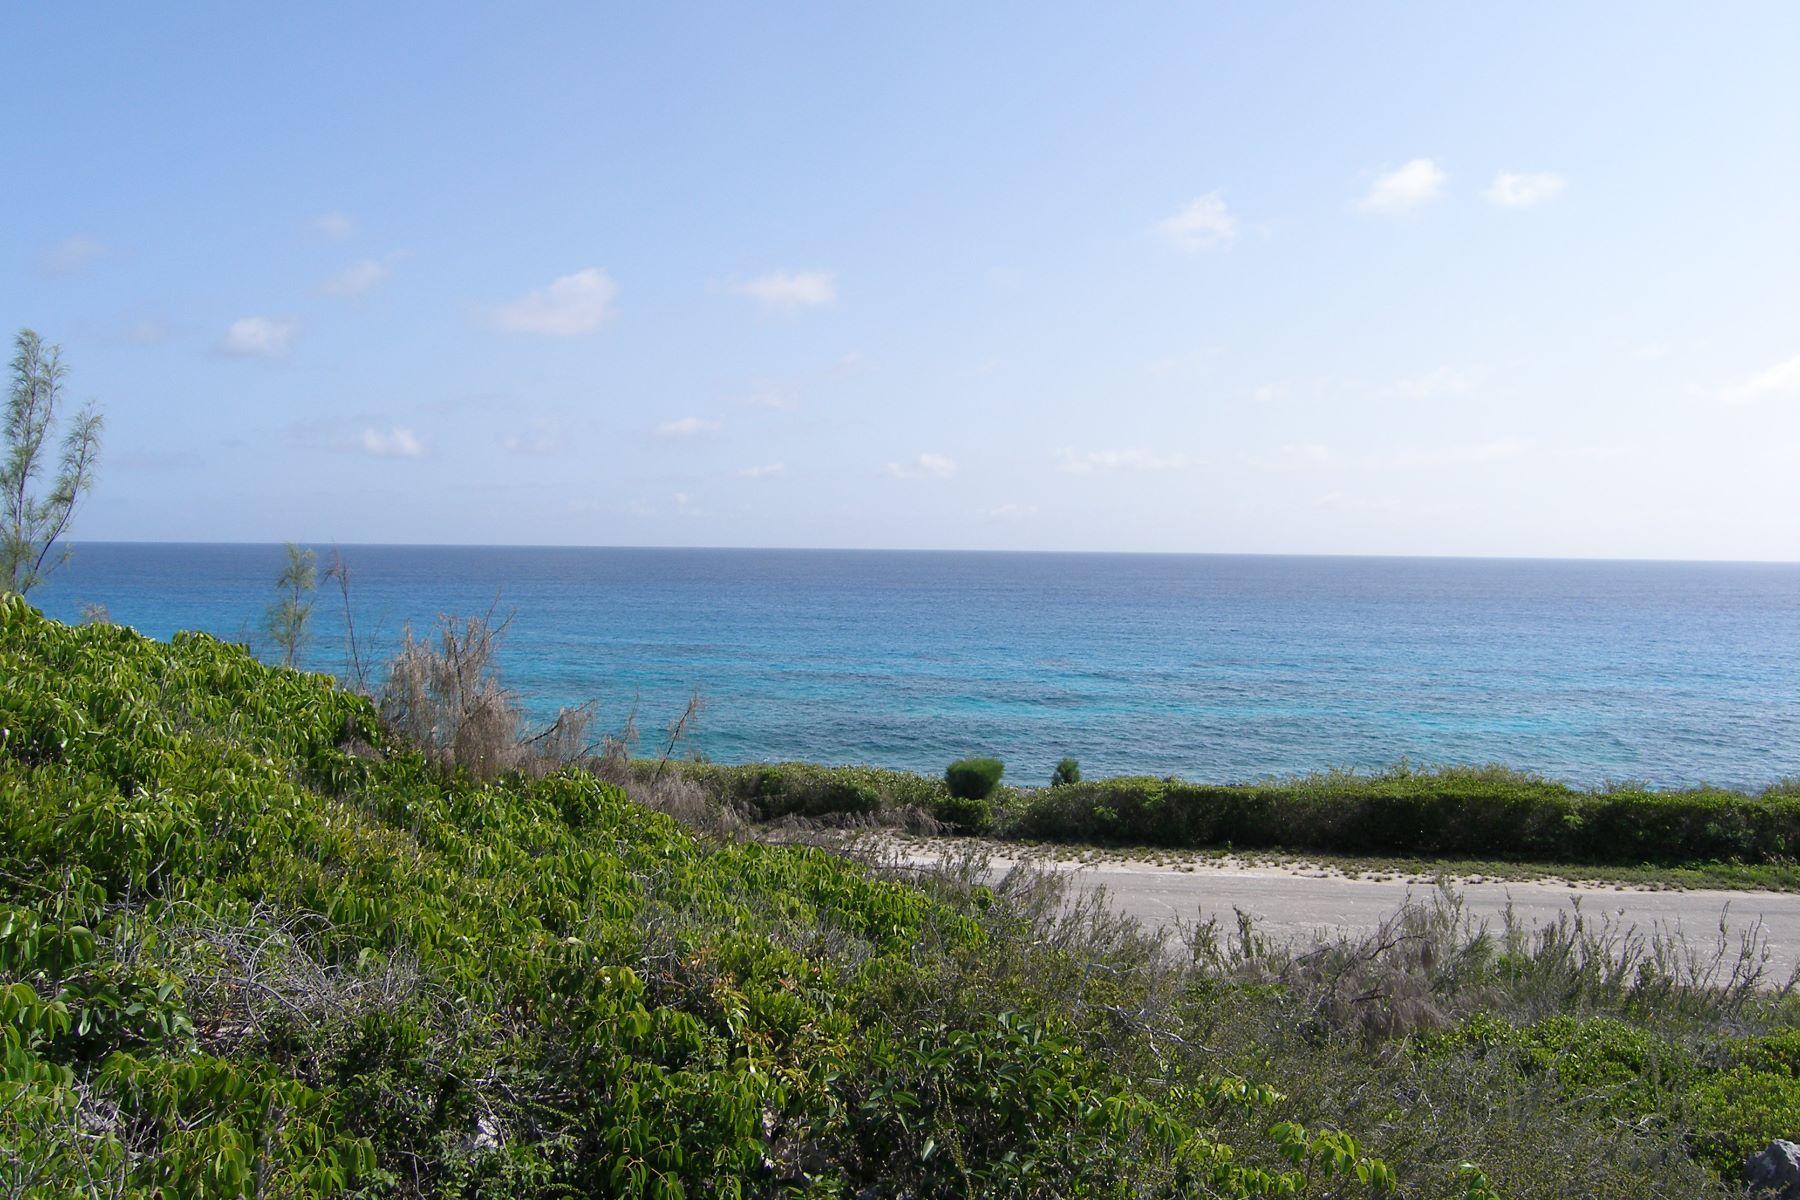 Terreno por un Venta en Lot 7, Block 6, Section A Rainbow Bay, Eleuthera Bahamas